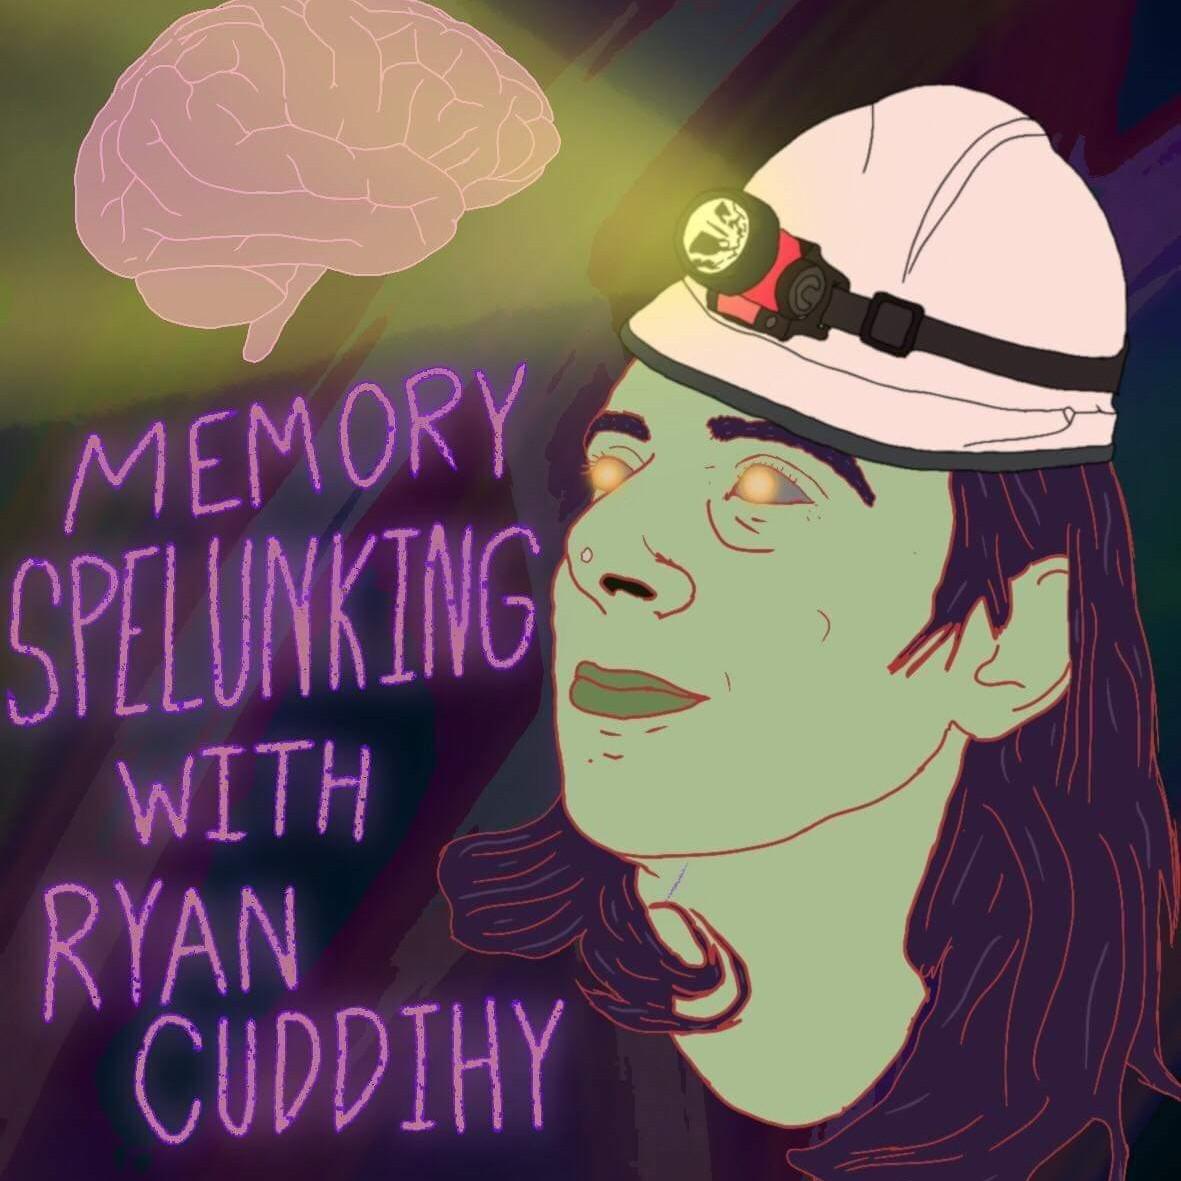 """Meta-entity"" Memory Spelunking with Ryan Cuddihy"